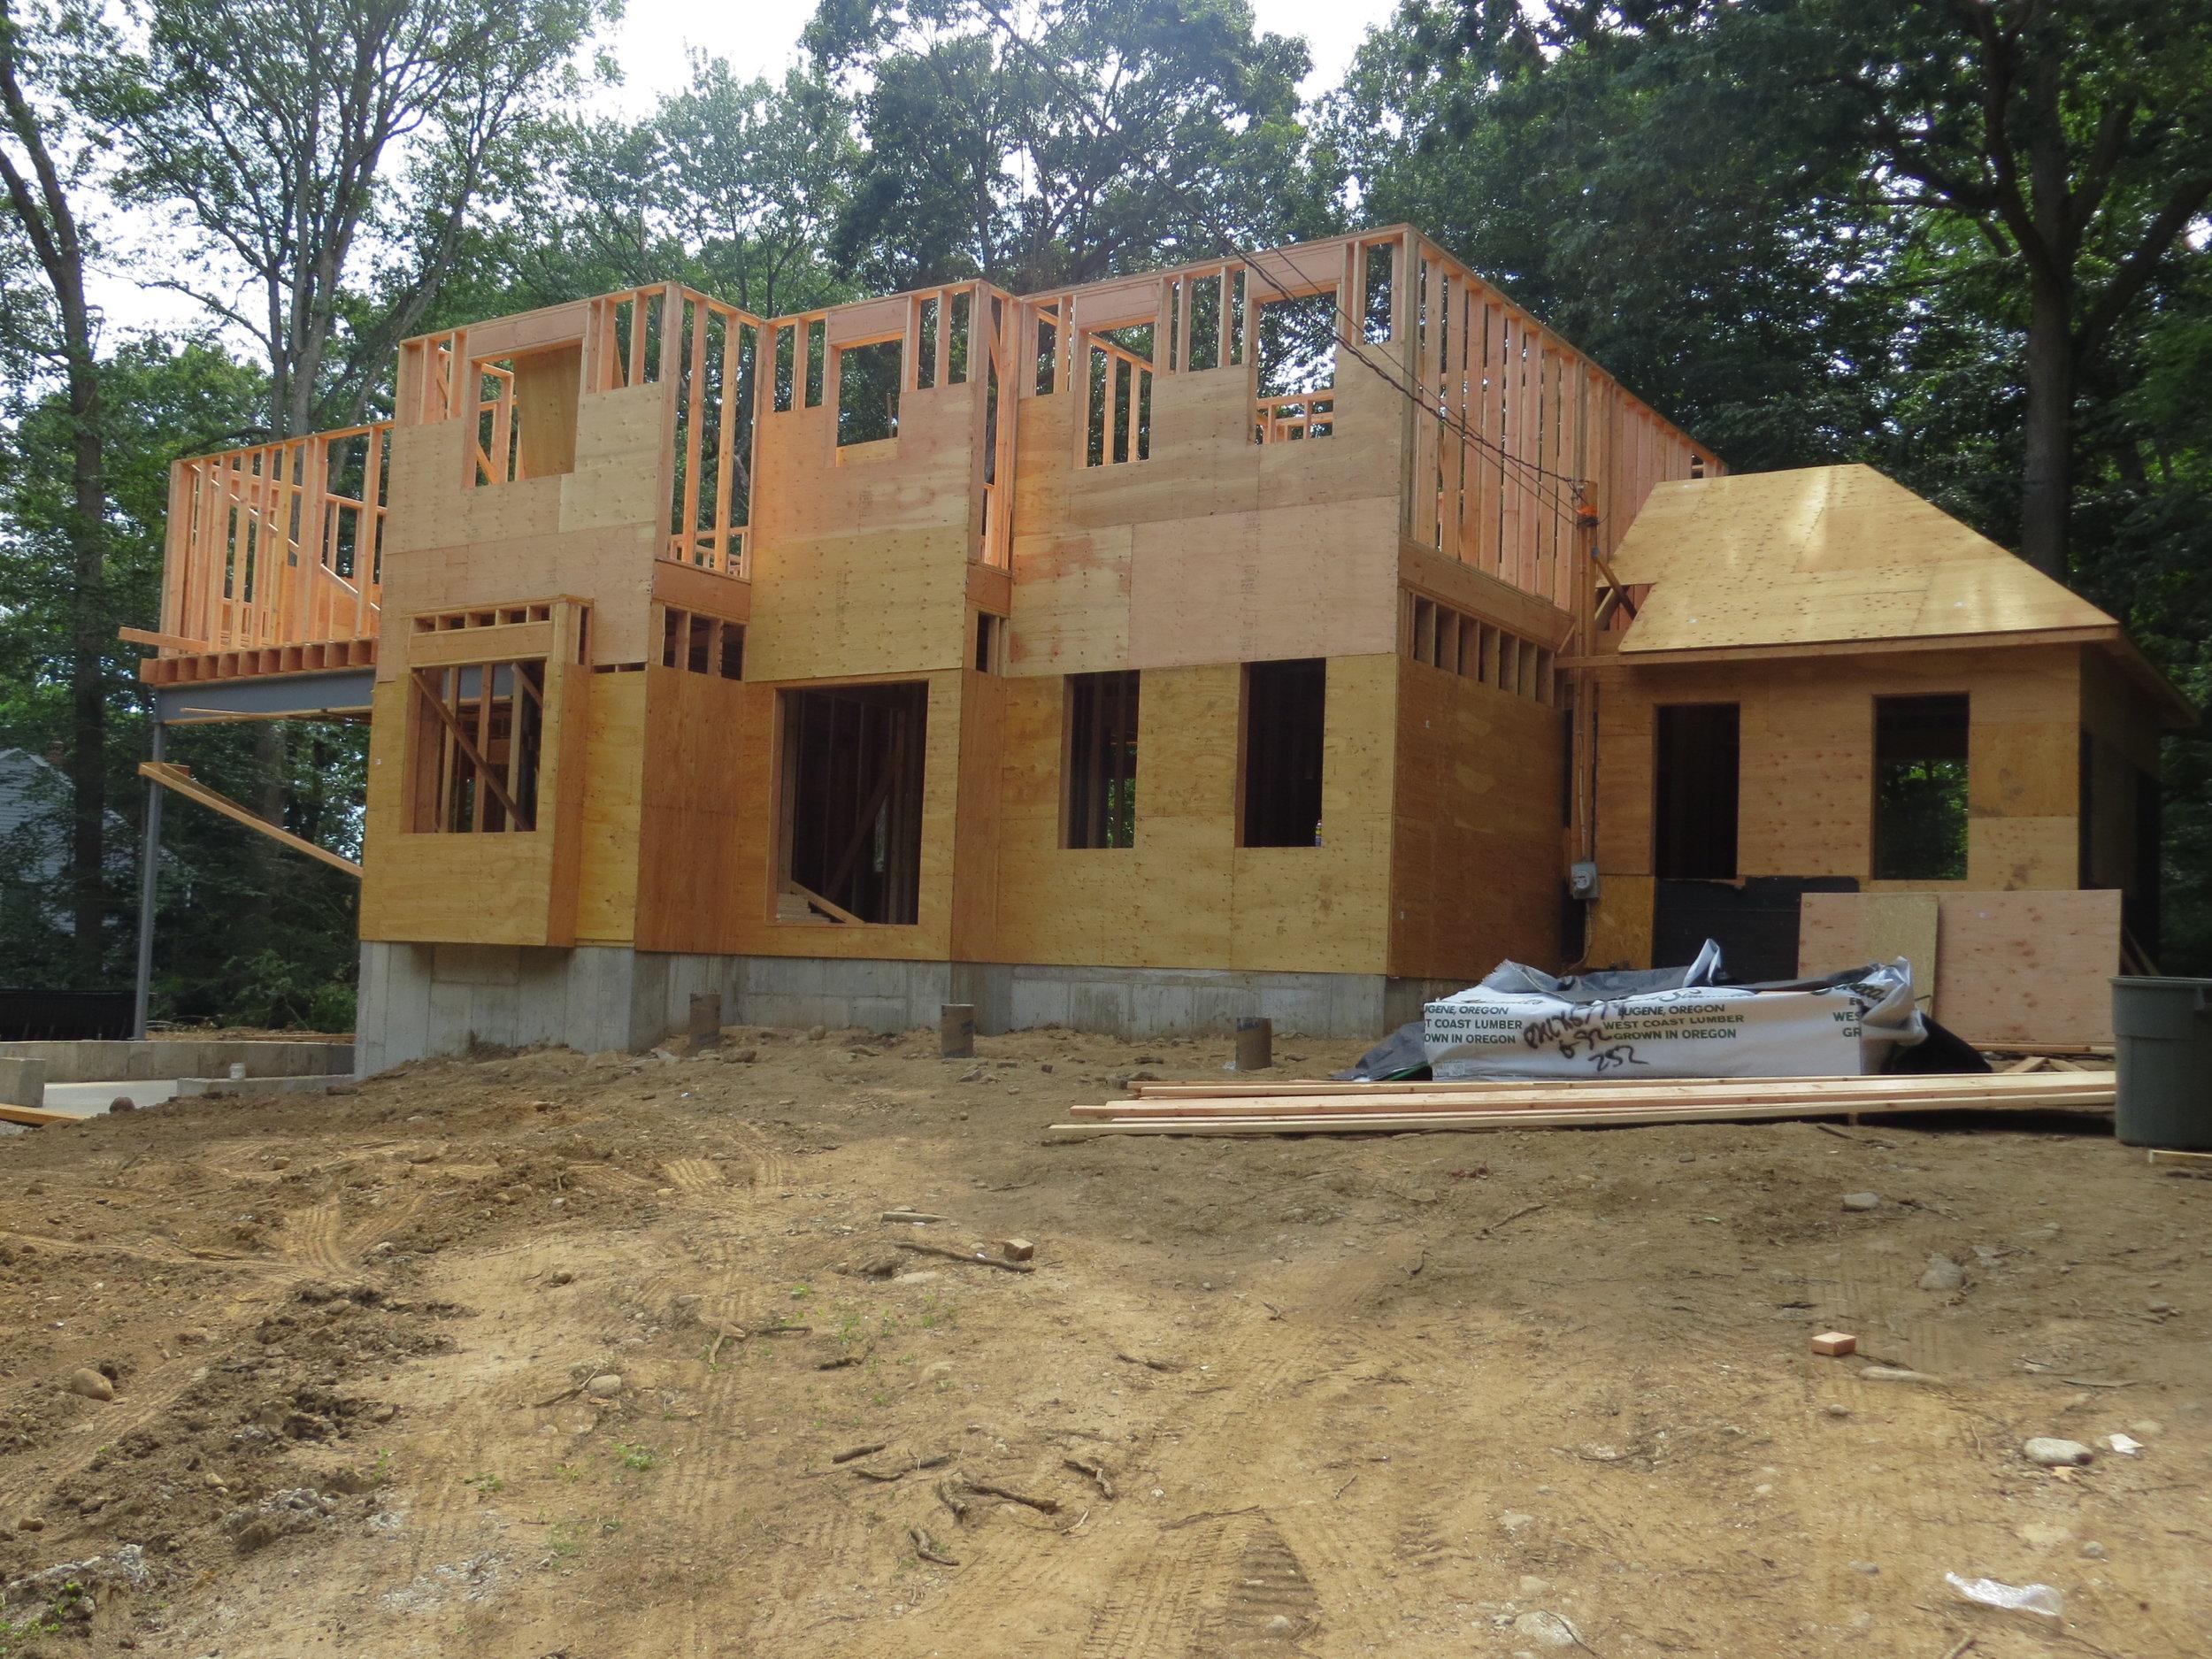 2014 06 28th Carl's House & Yard (1).JPG